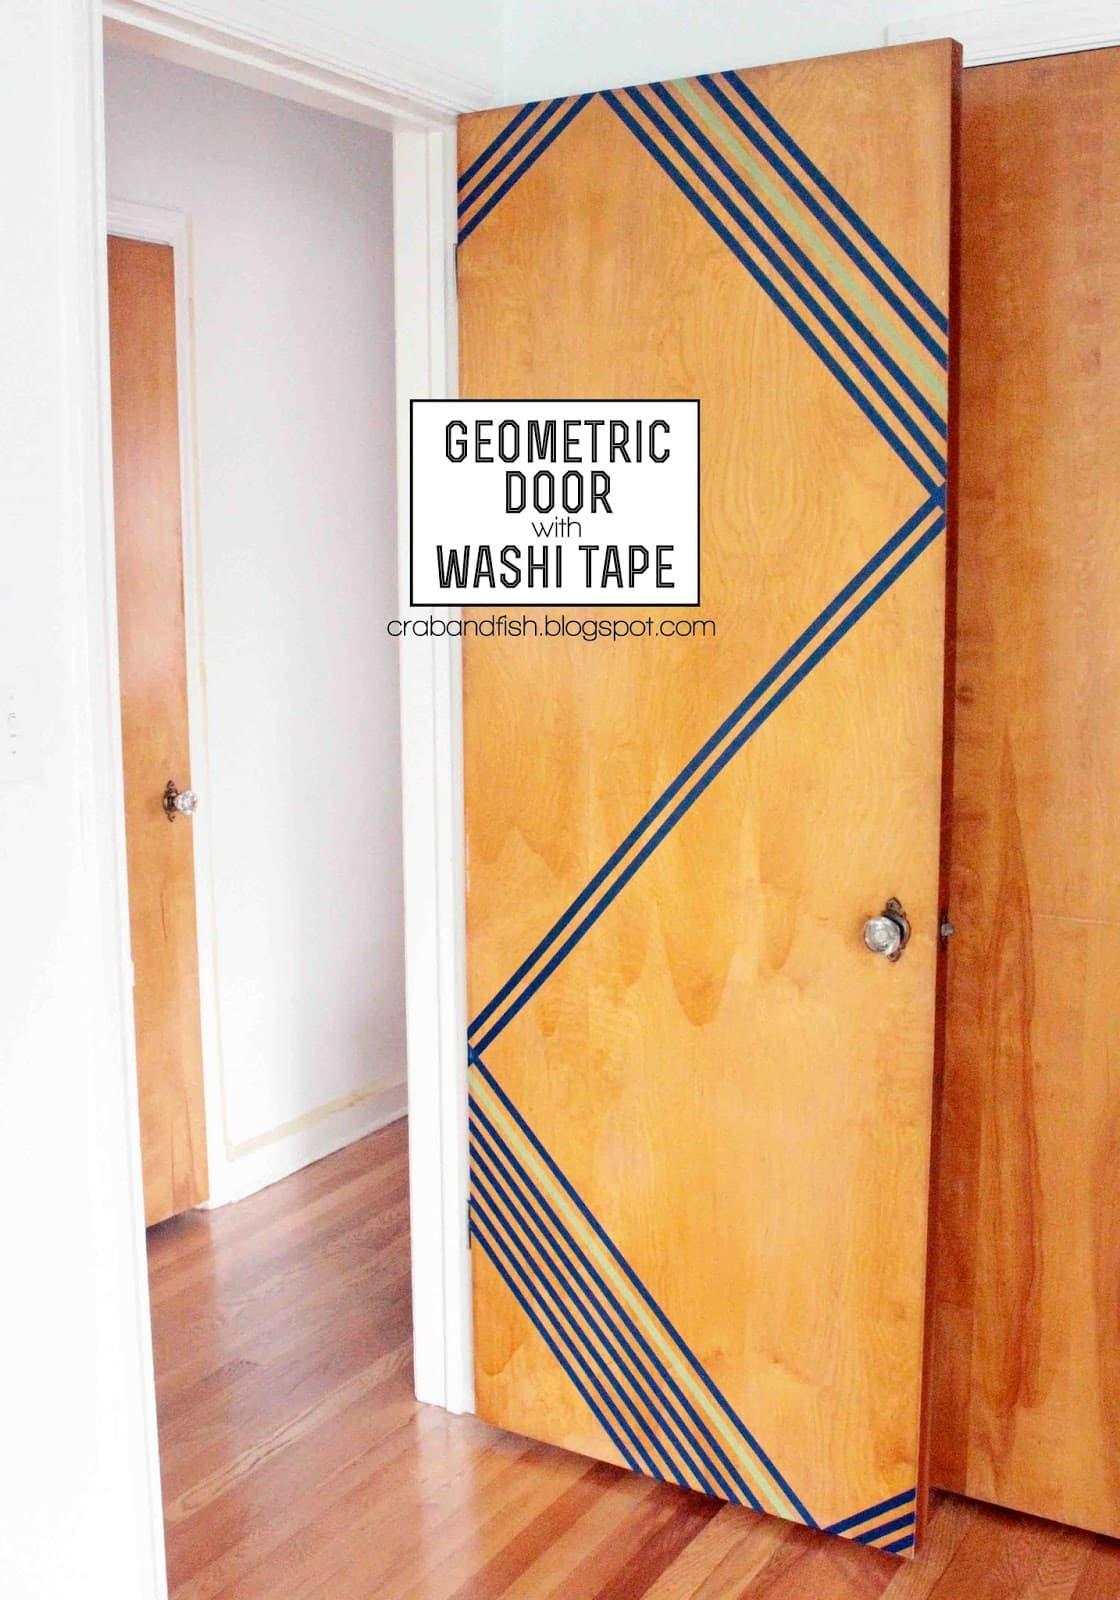 Geometric Door With Washi Tape